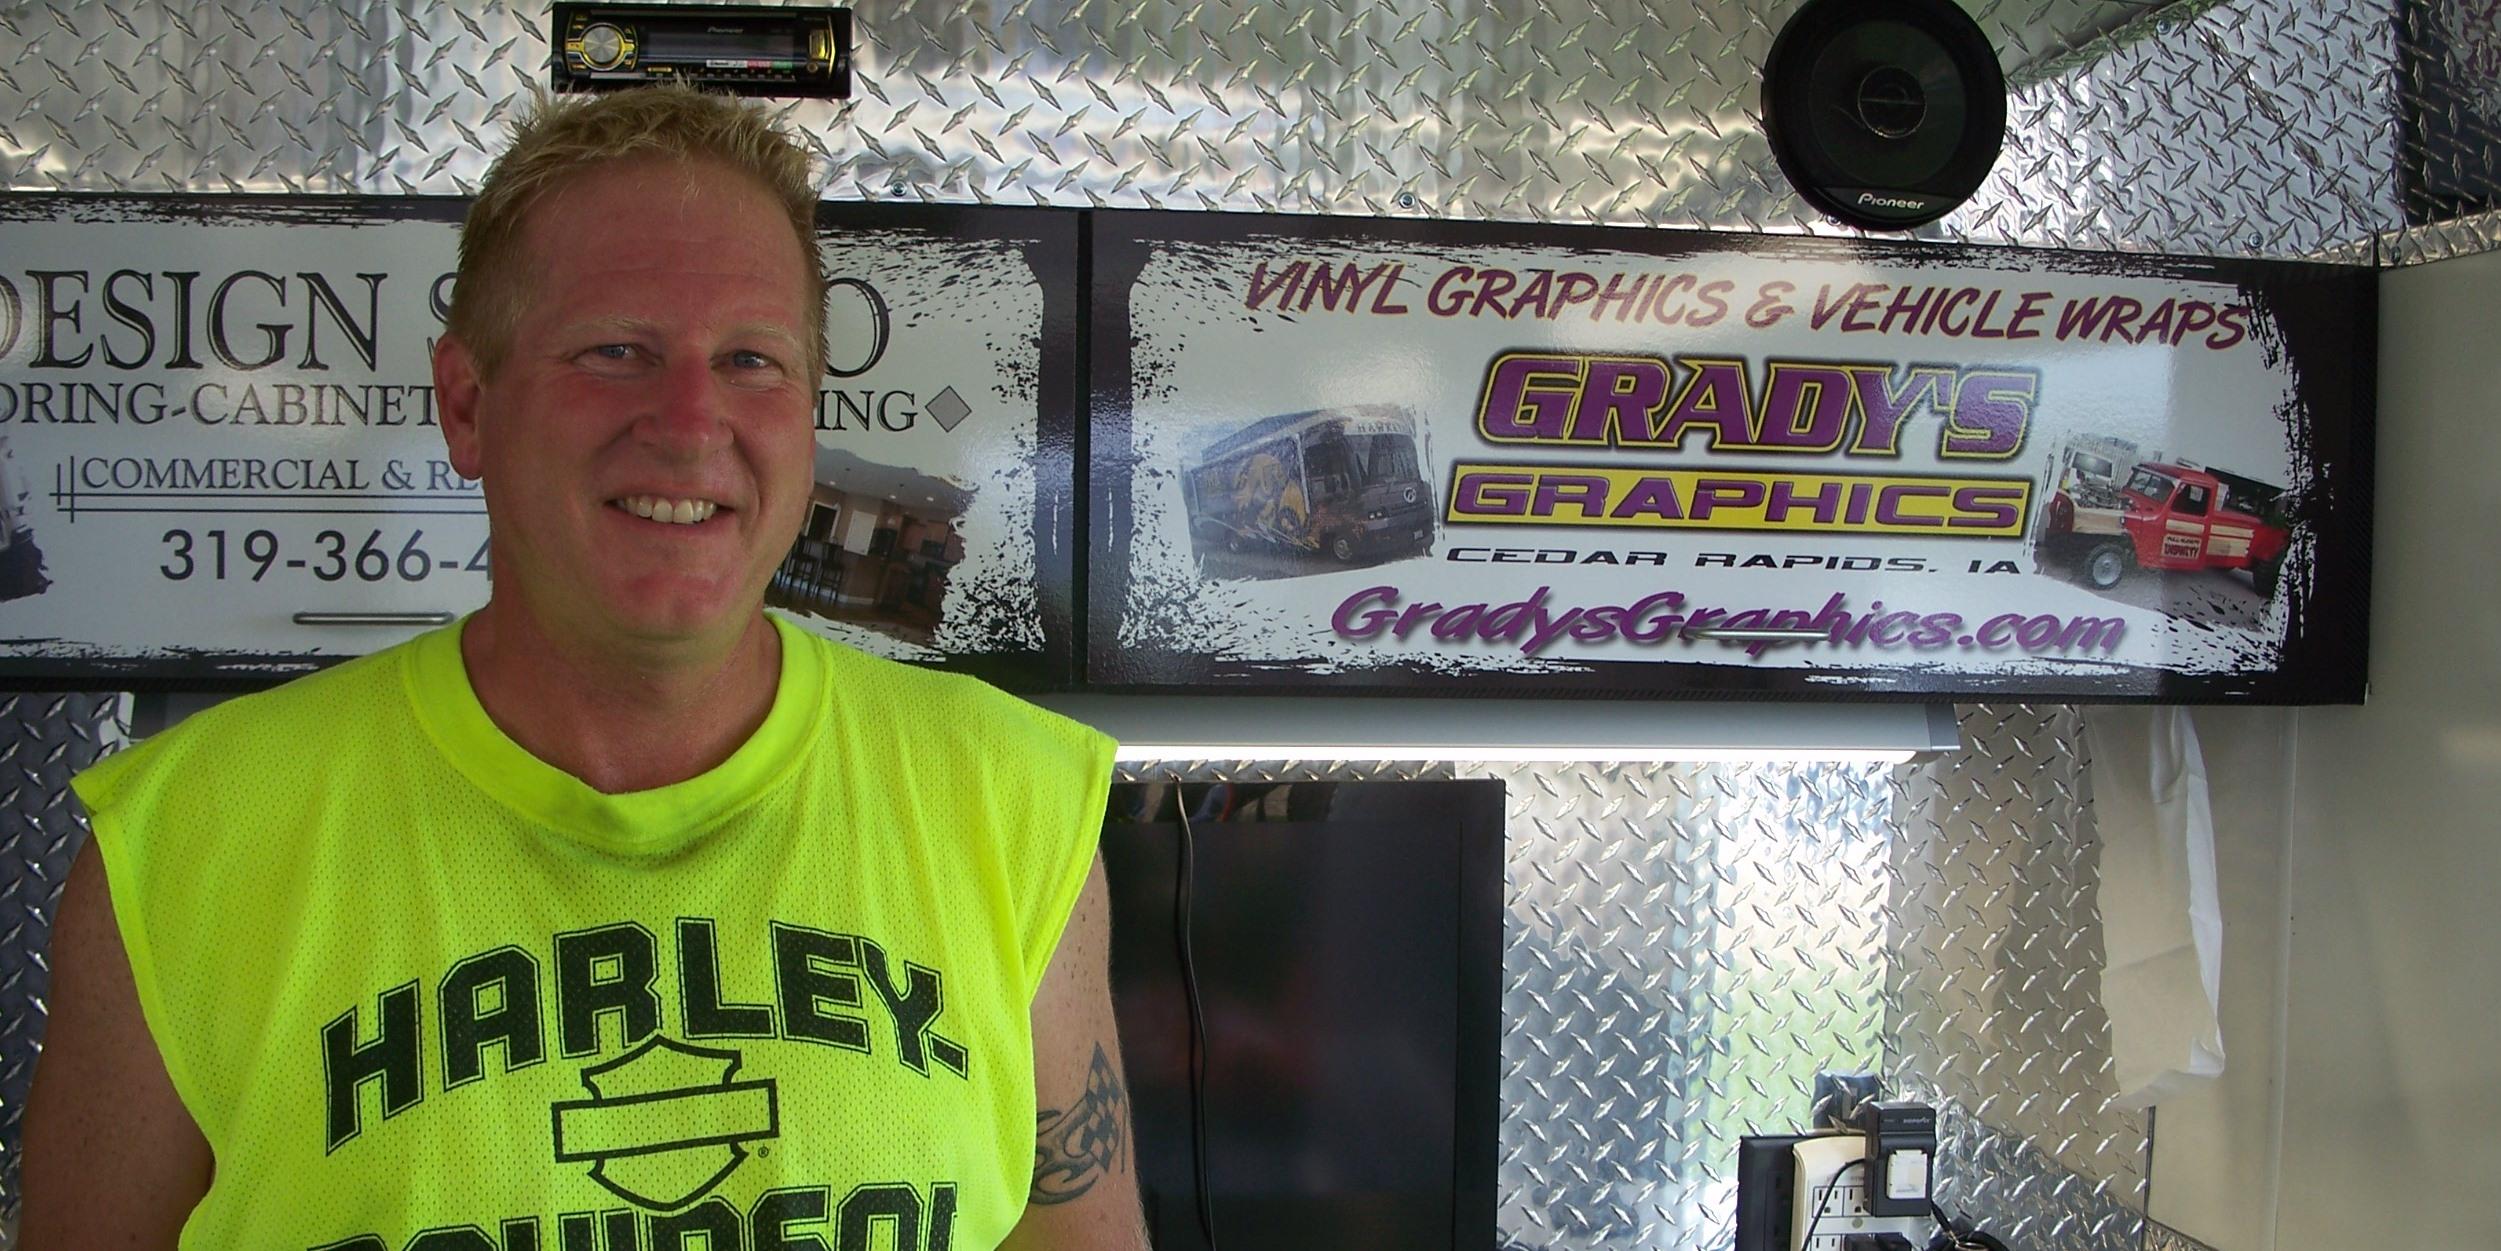 Scott Grady, Grady's Graphics